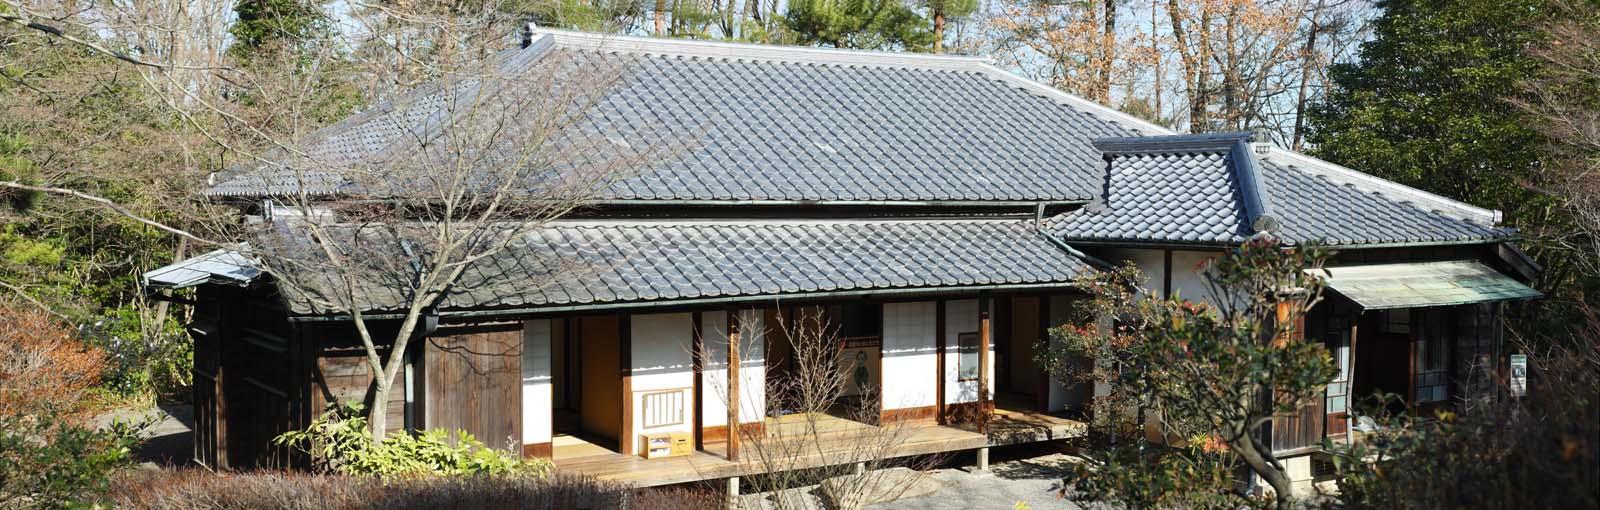 Yun Free Stock Photos : No. 9262 Meiji-mura Village Museum ...